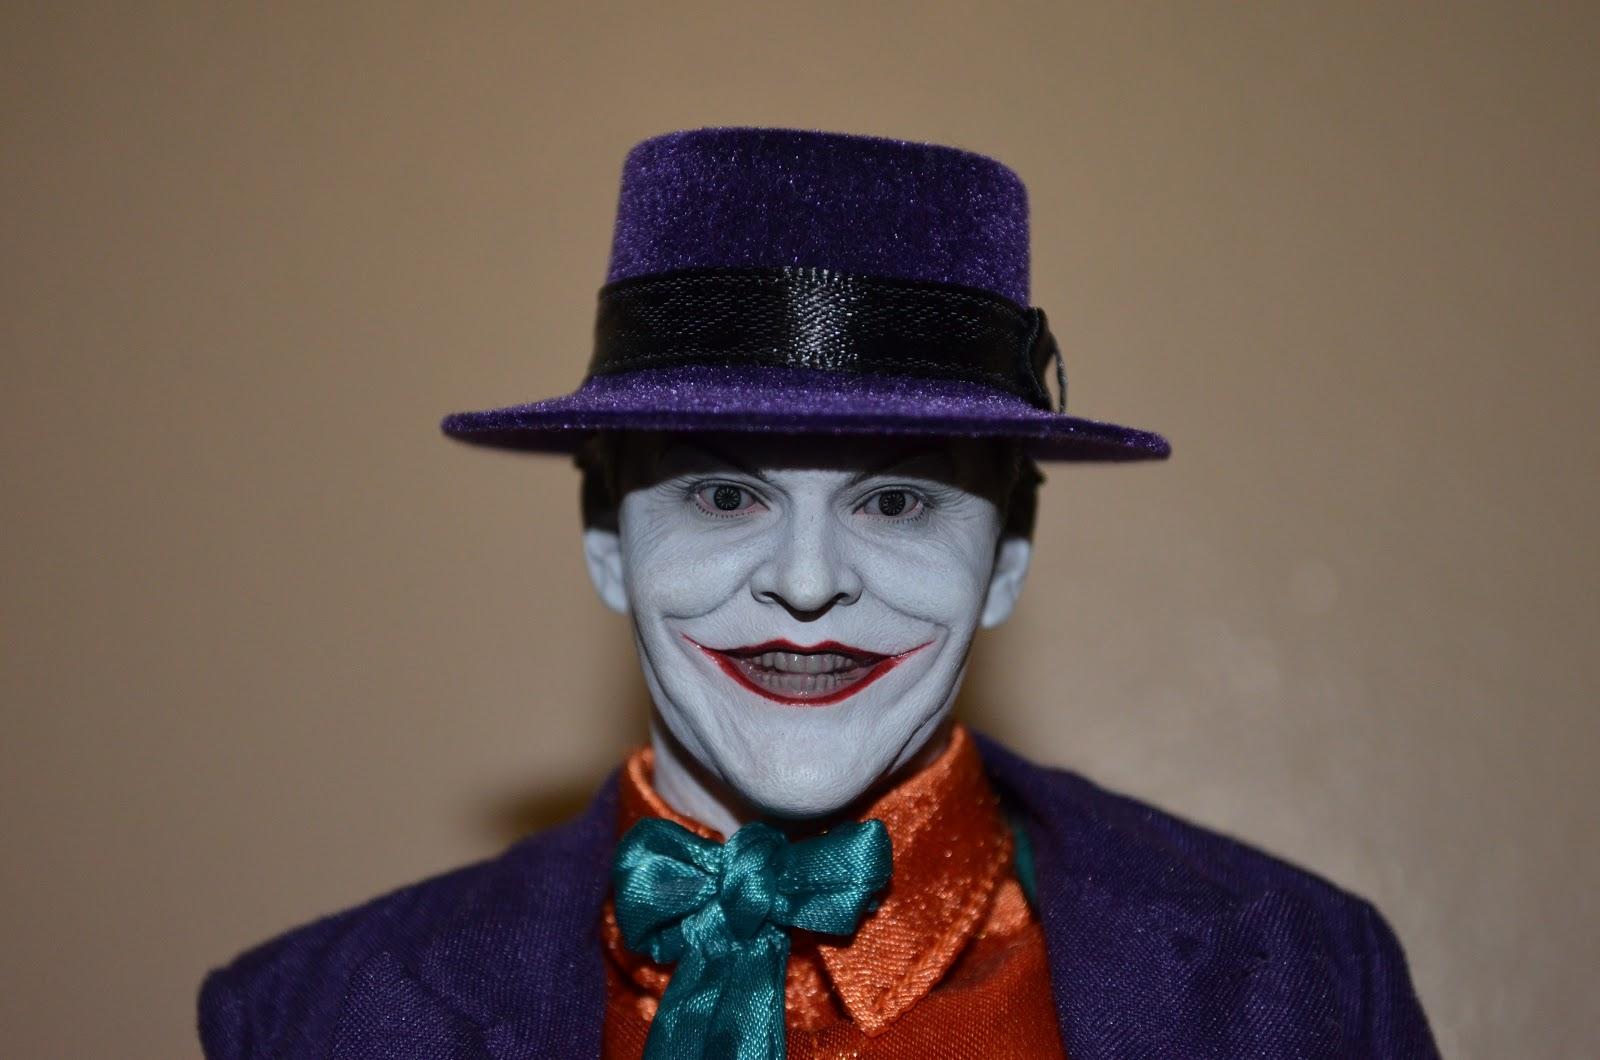 Jack Nicholson Joker Costume  sc 1 st  timehd & Jack Nicholson Joker Costume 93558 | TIMEHD